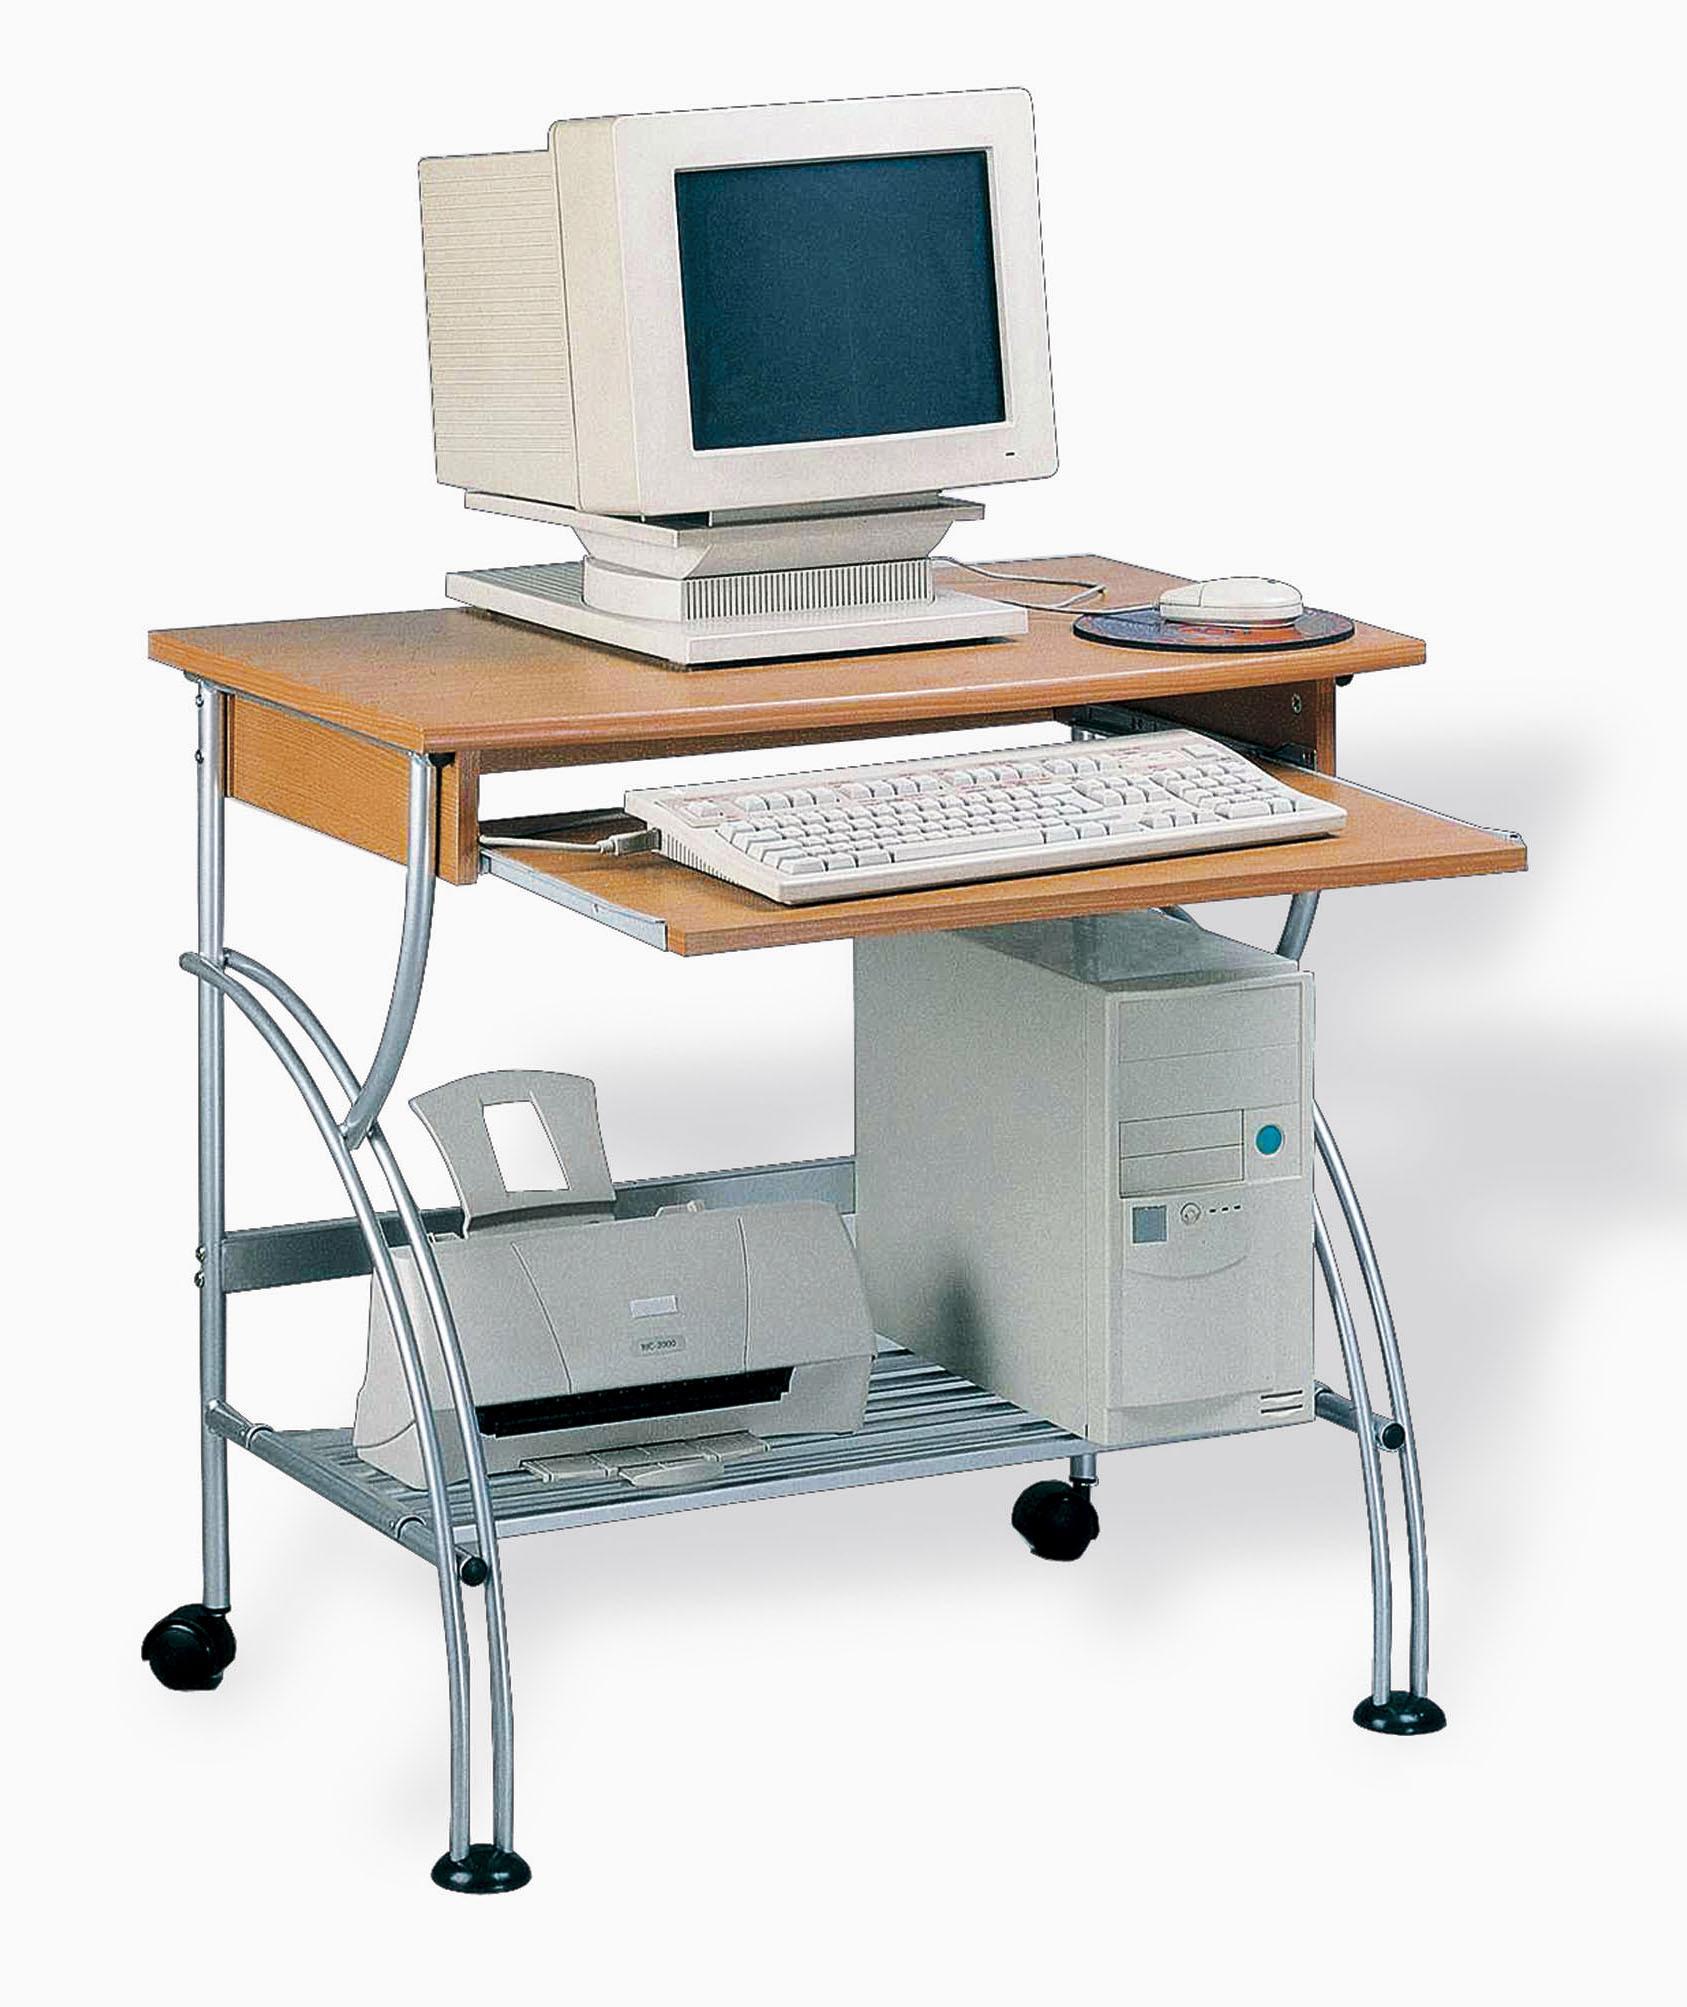 mesa ordenador mk1 decora descans mueble complemento